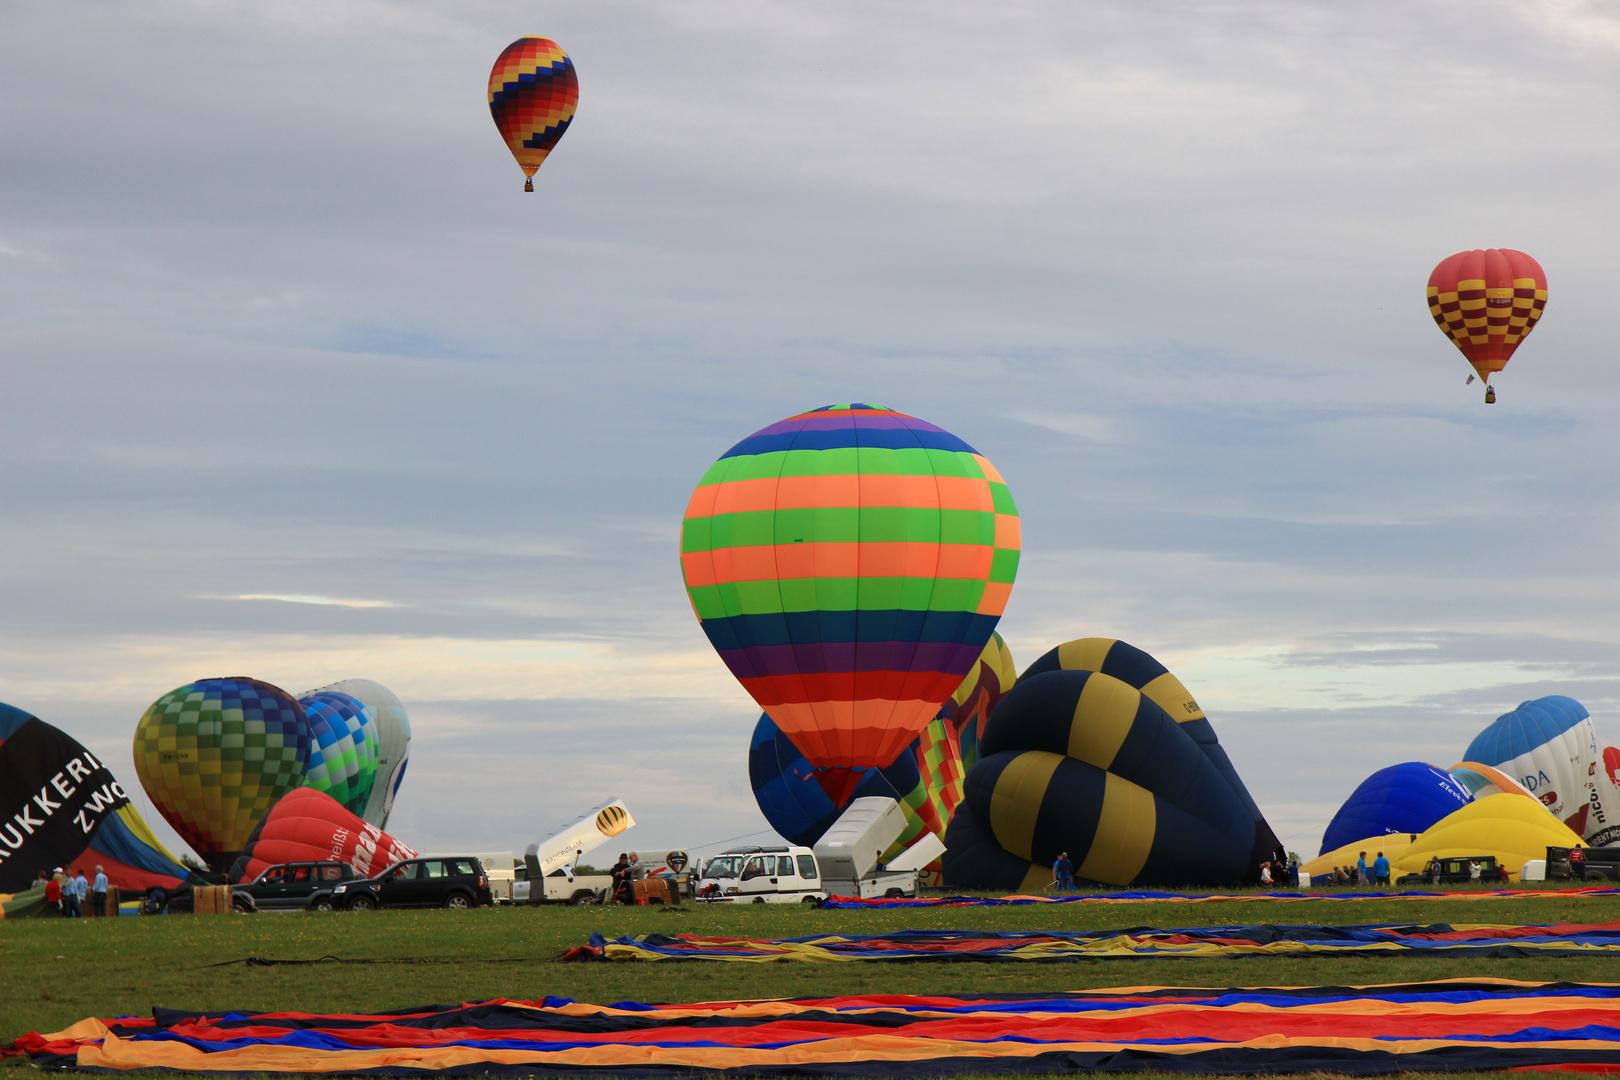 Heißluftballon Festival in Metz